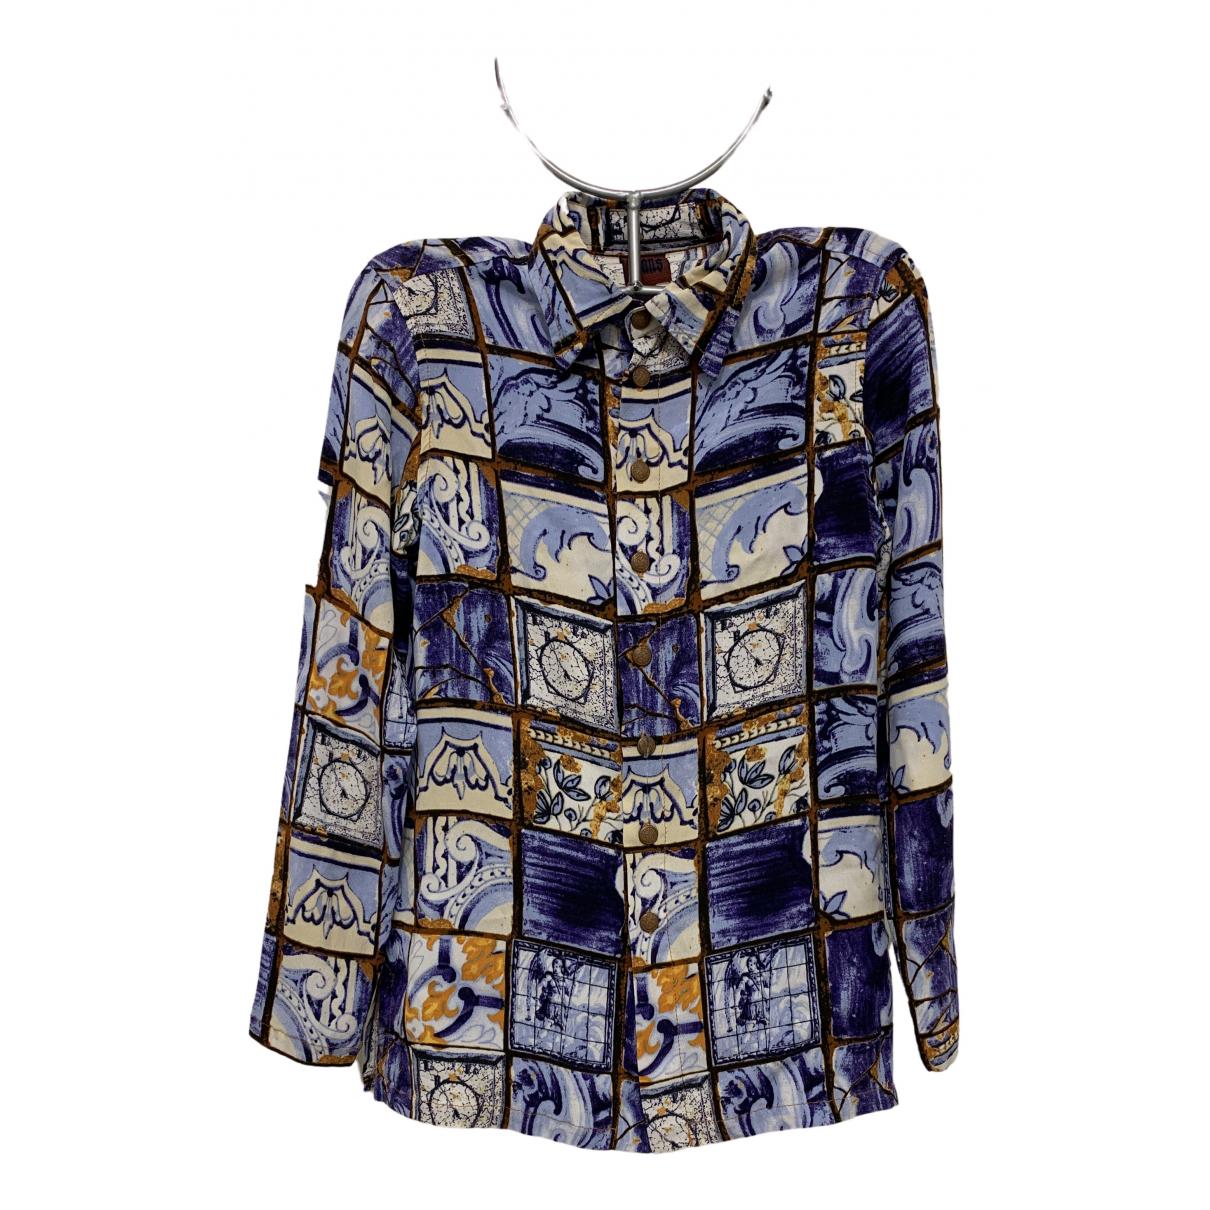 Jean Paul Gaultier - Top   pour femme - multicolore